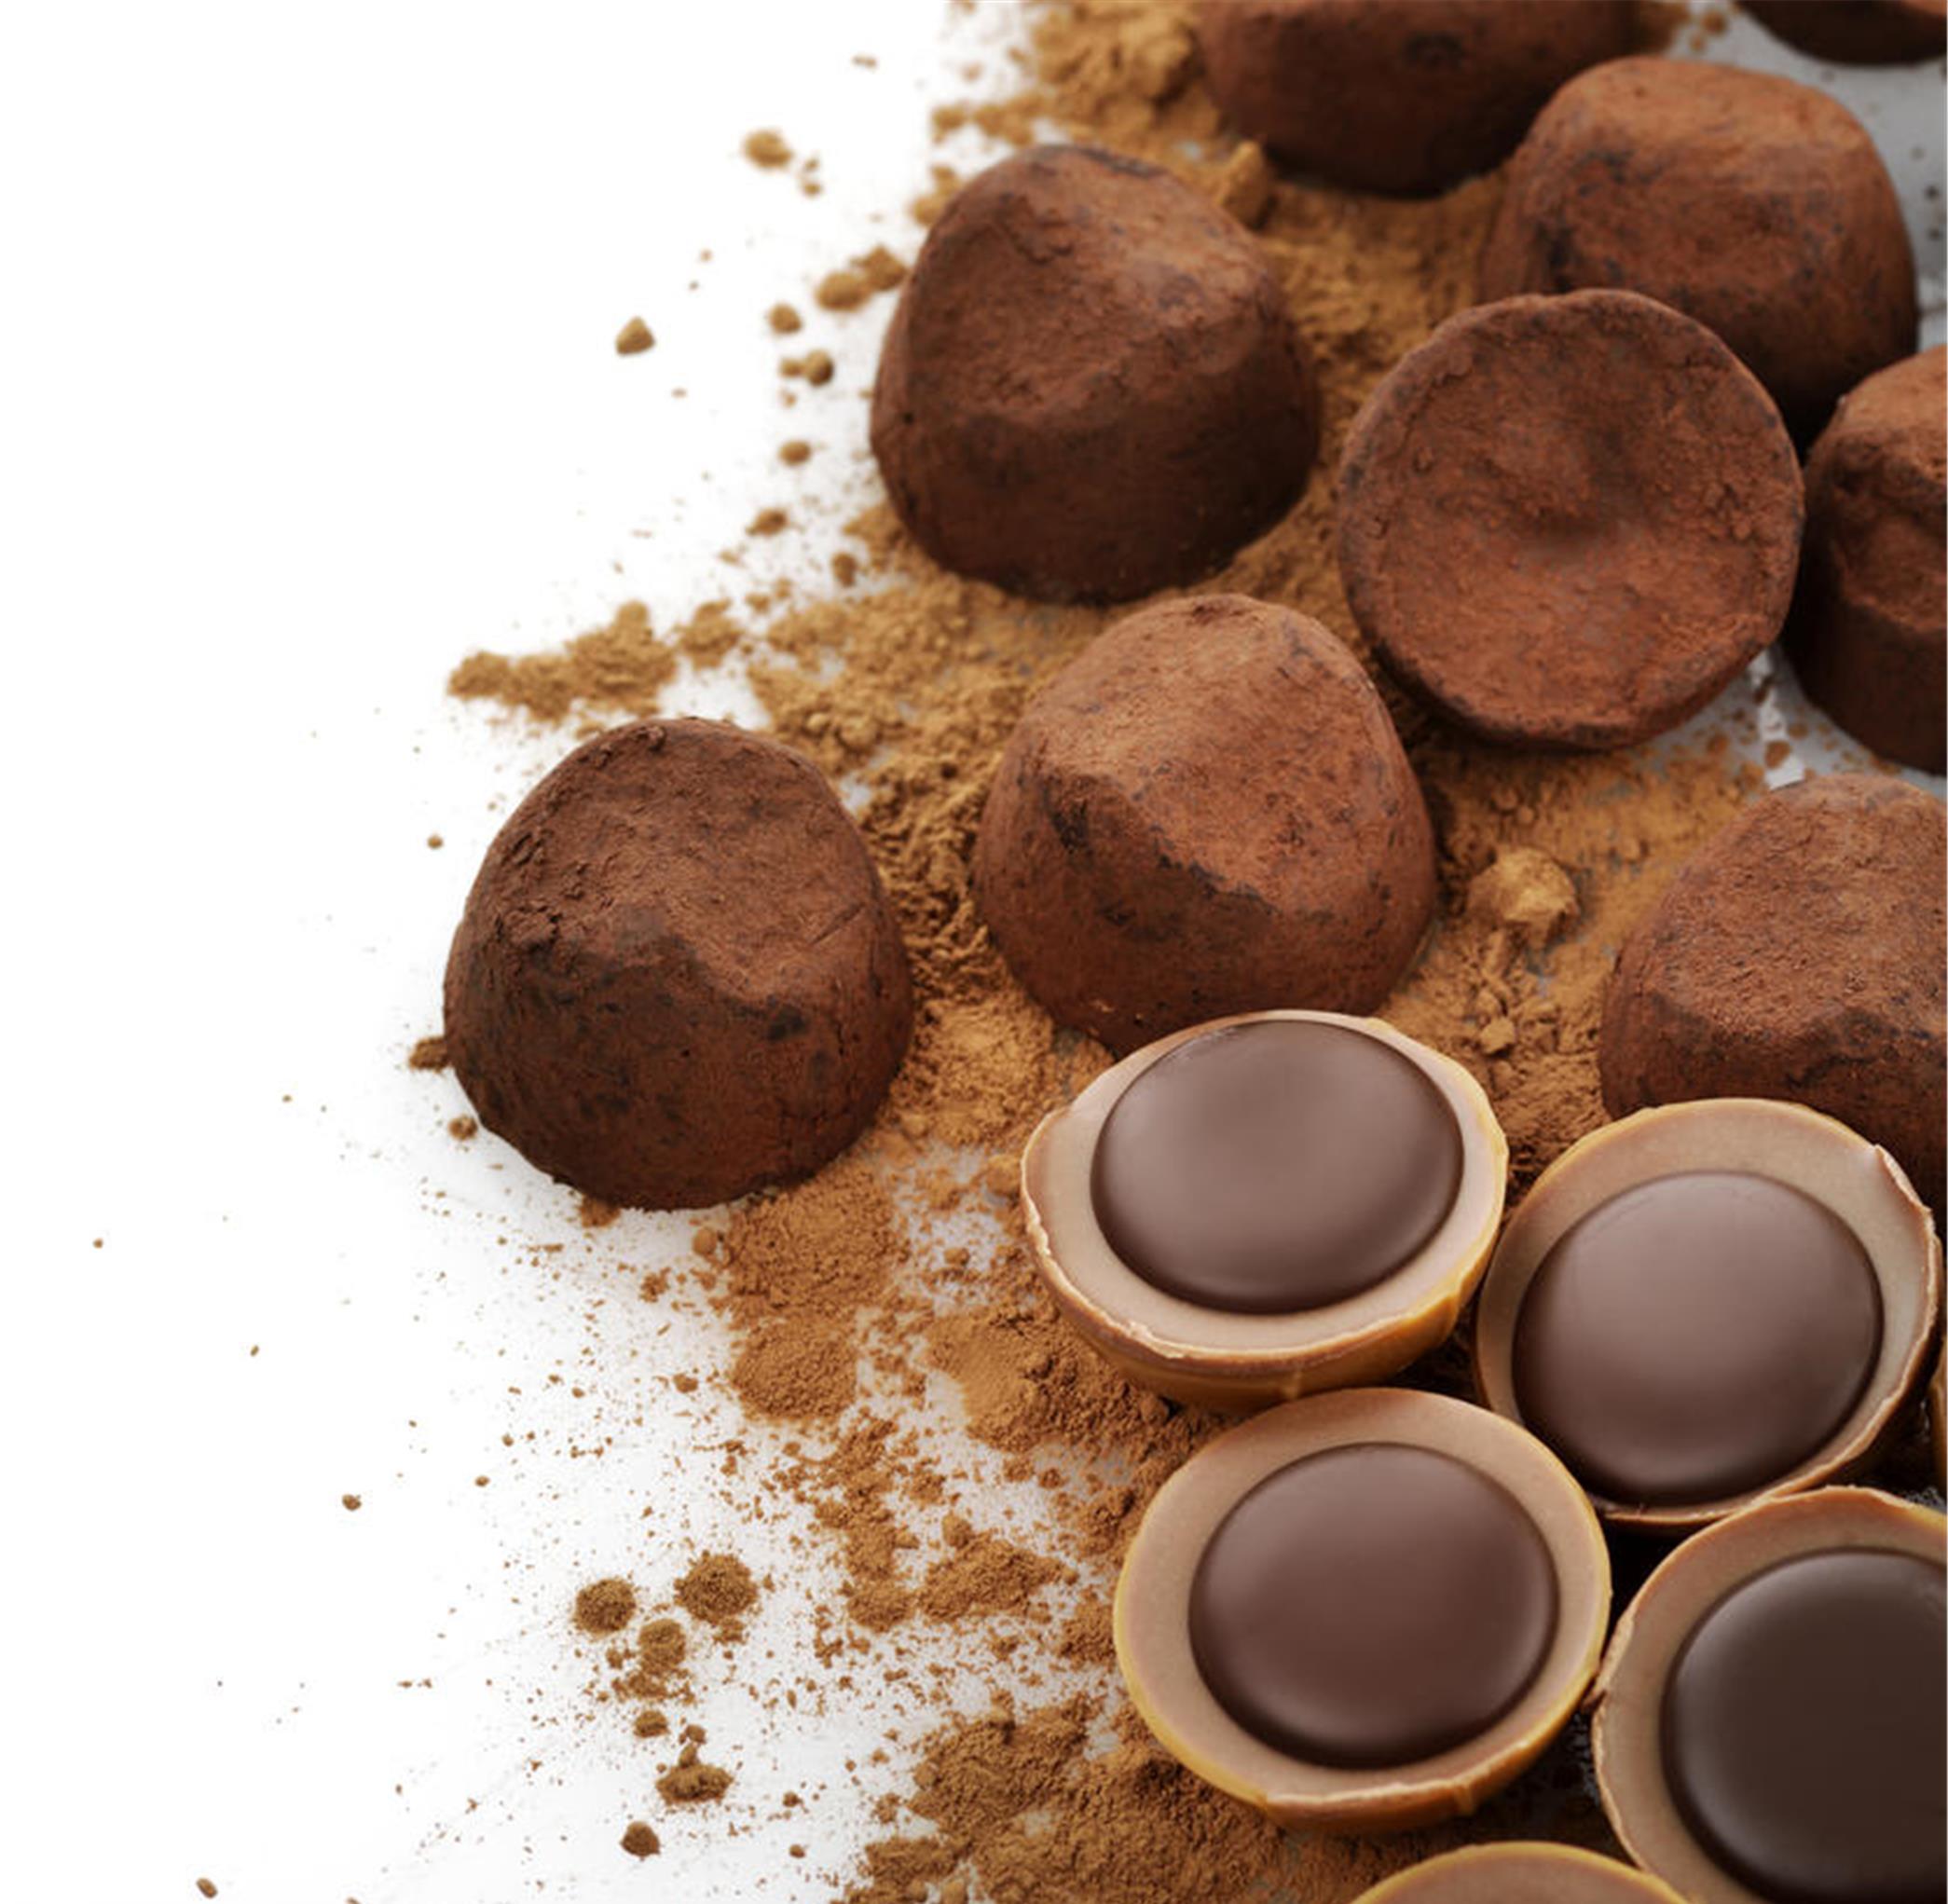 SCP C 600巧克力糖果,你吃的那块,可能是上一个人拉出来的 甜品 scp 每日推荐  第5张